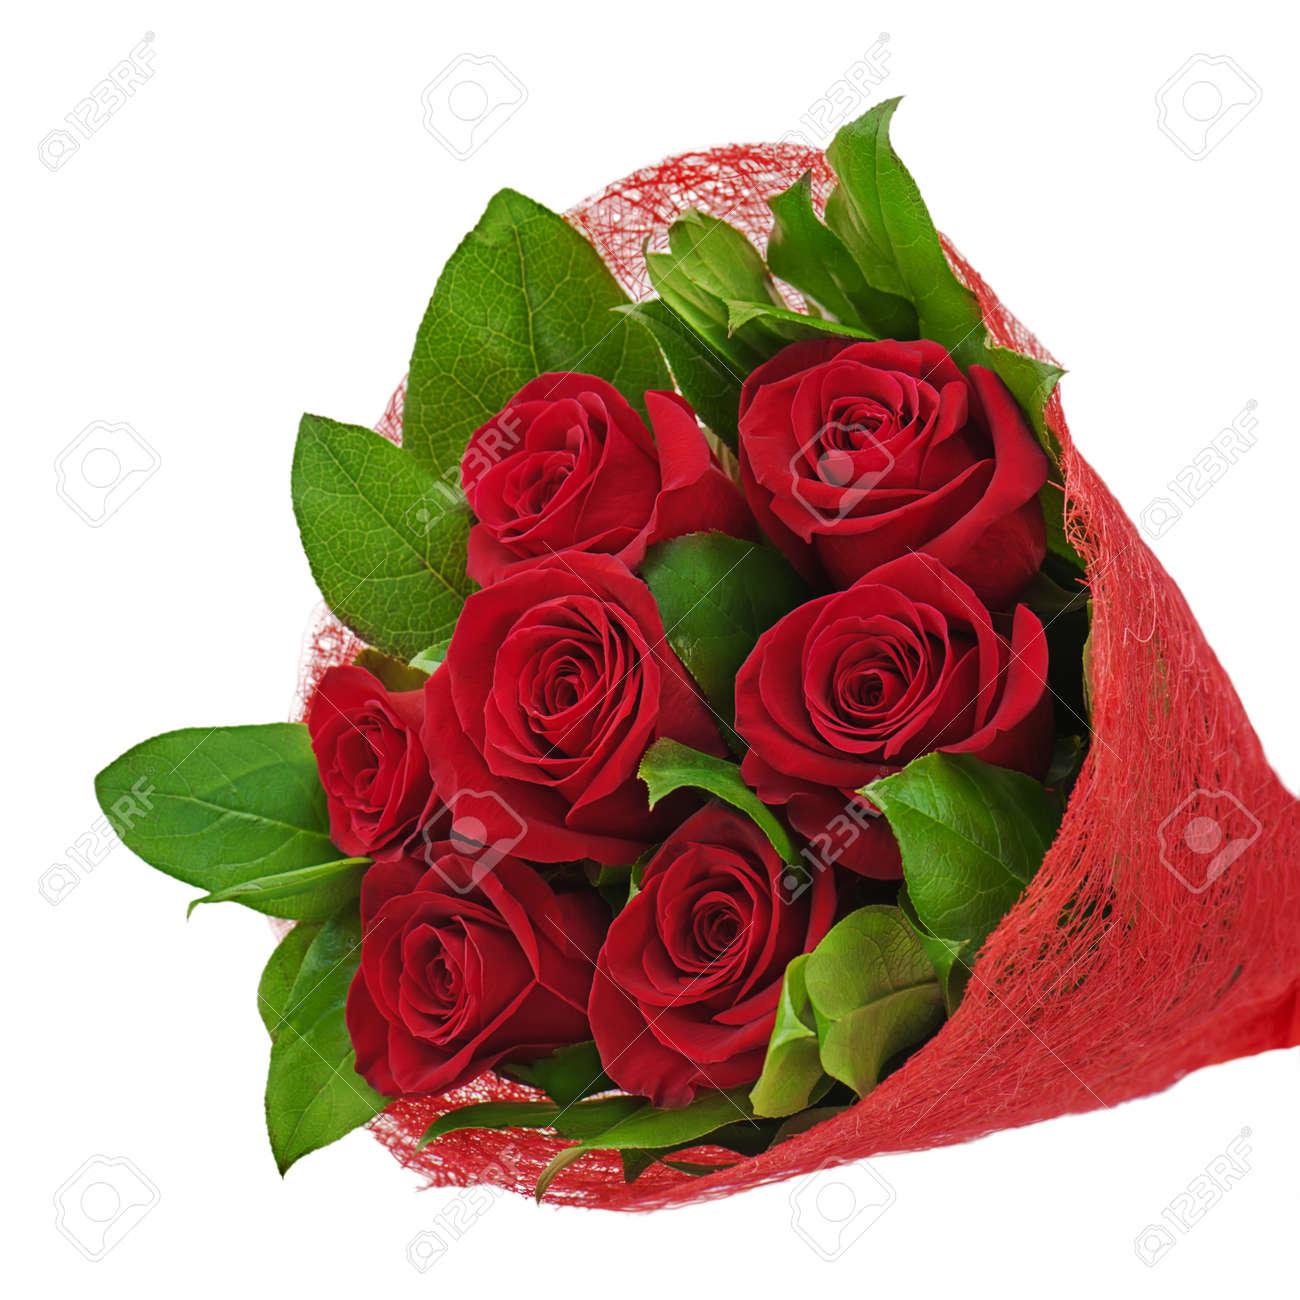 بمناسبة الدكرة السابعة لمنتدنا الغالي احلى دليل 18388547-bouquet-de-fleurs-color-de-roses-rouges-isol-sur-fond-blanc-Banque-d%27images